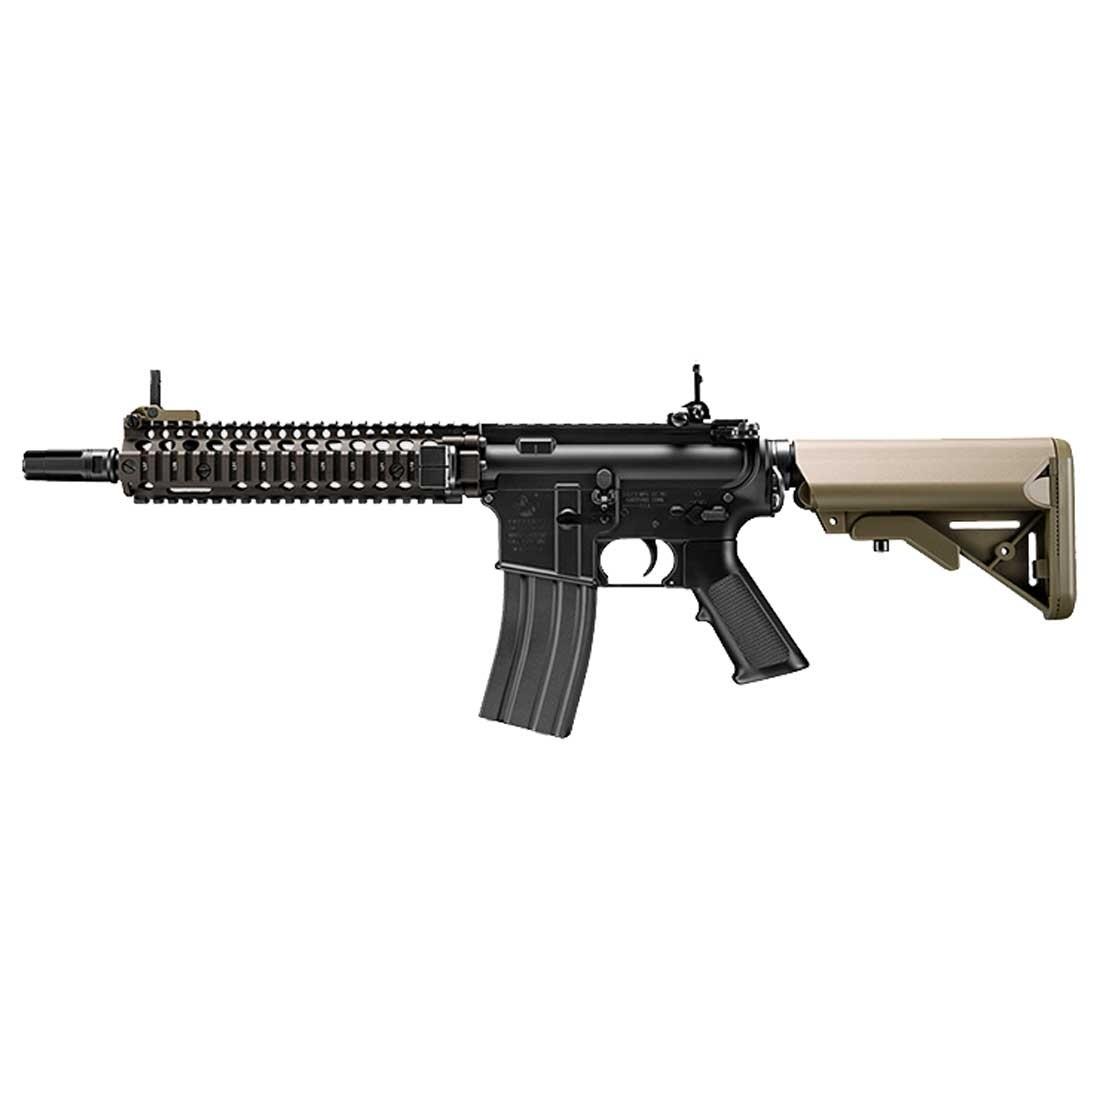 Tokyo Marui MK18 Mod 1 M4 CQBR NGRS Next Gen Recoil System EBB Rifle - PRE-ORDER